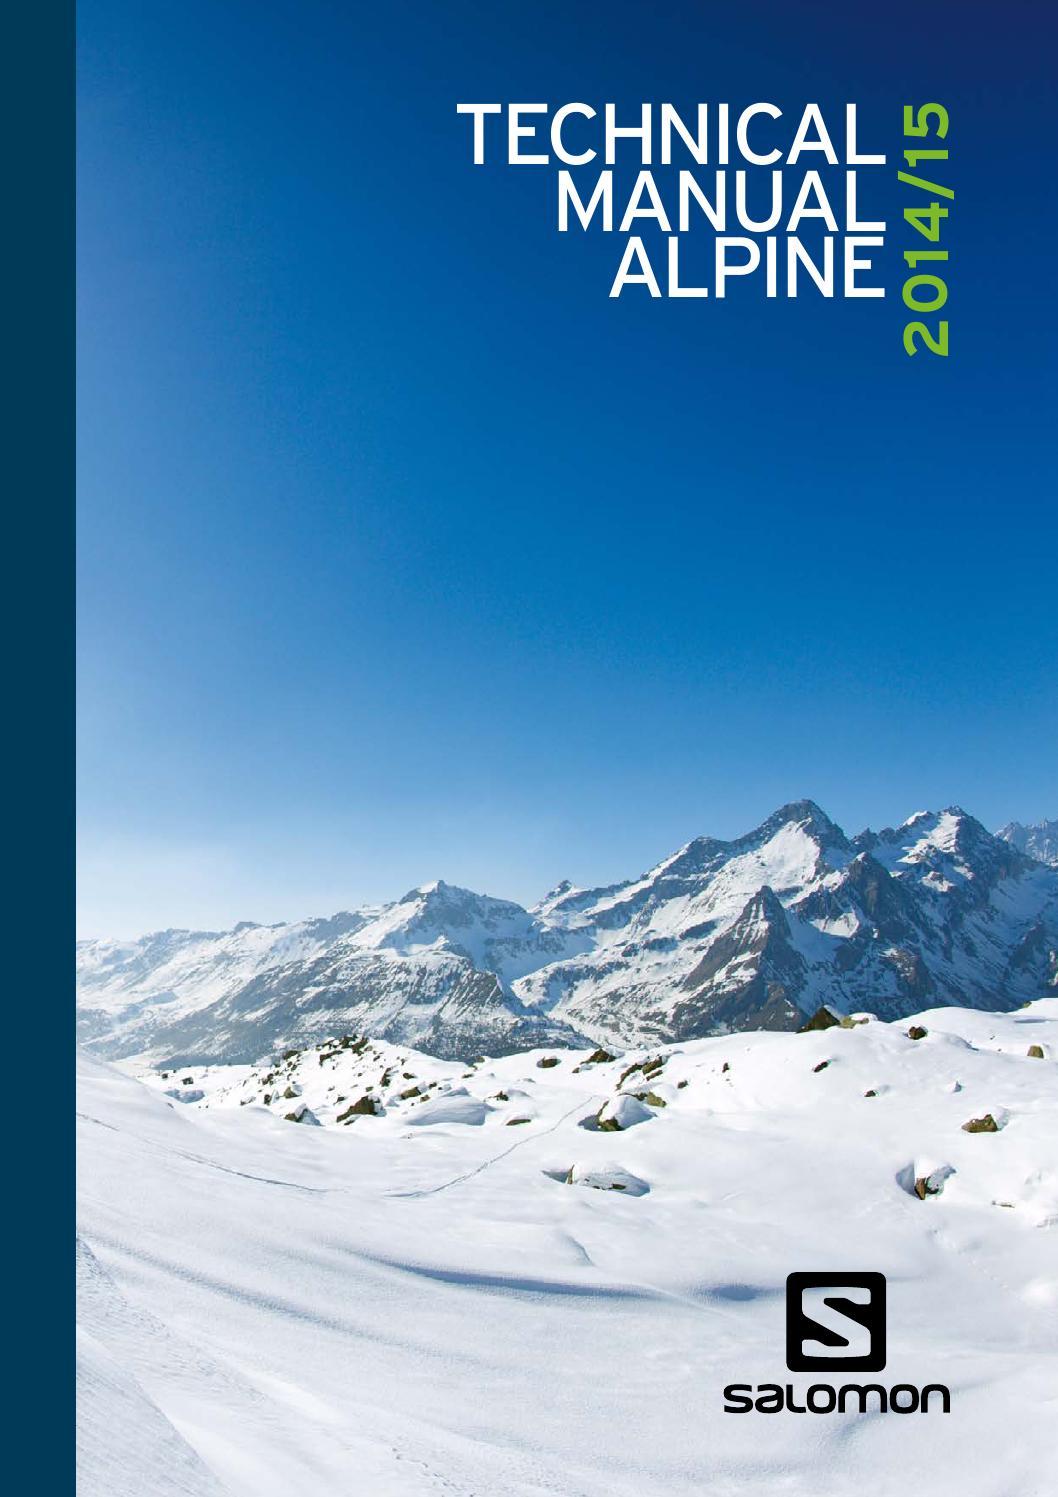 Atomic alpine tech manual 2018/19 by salomon issuu.